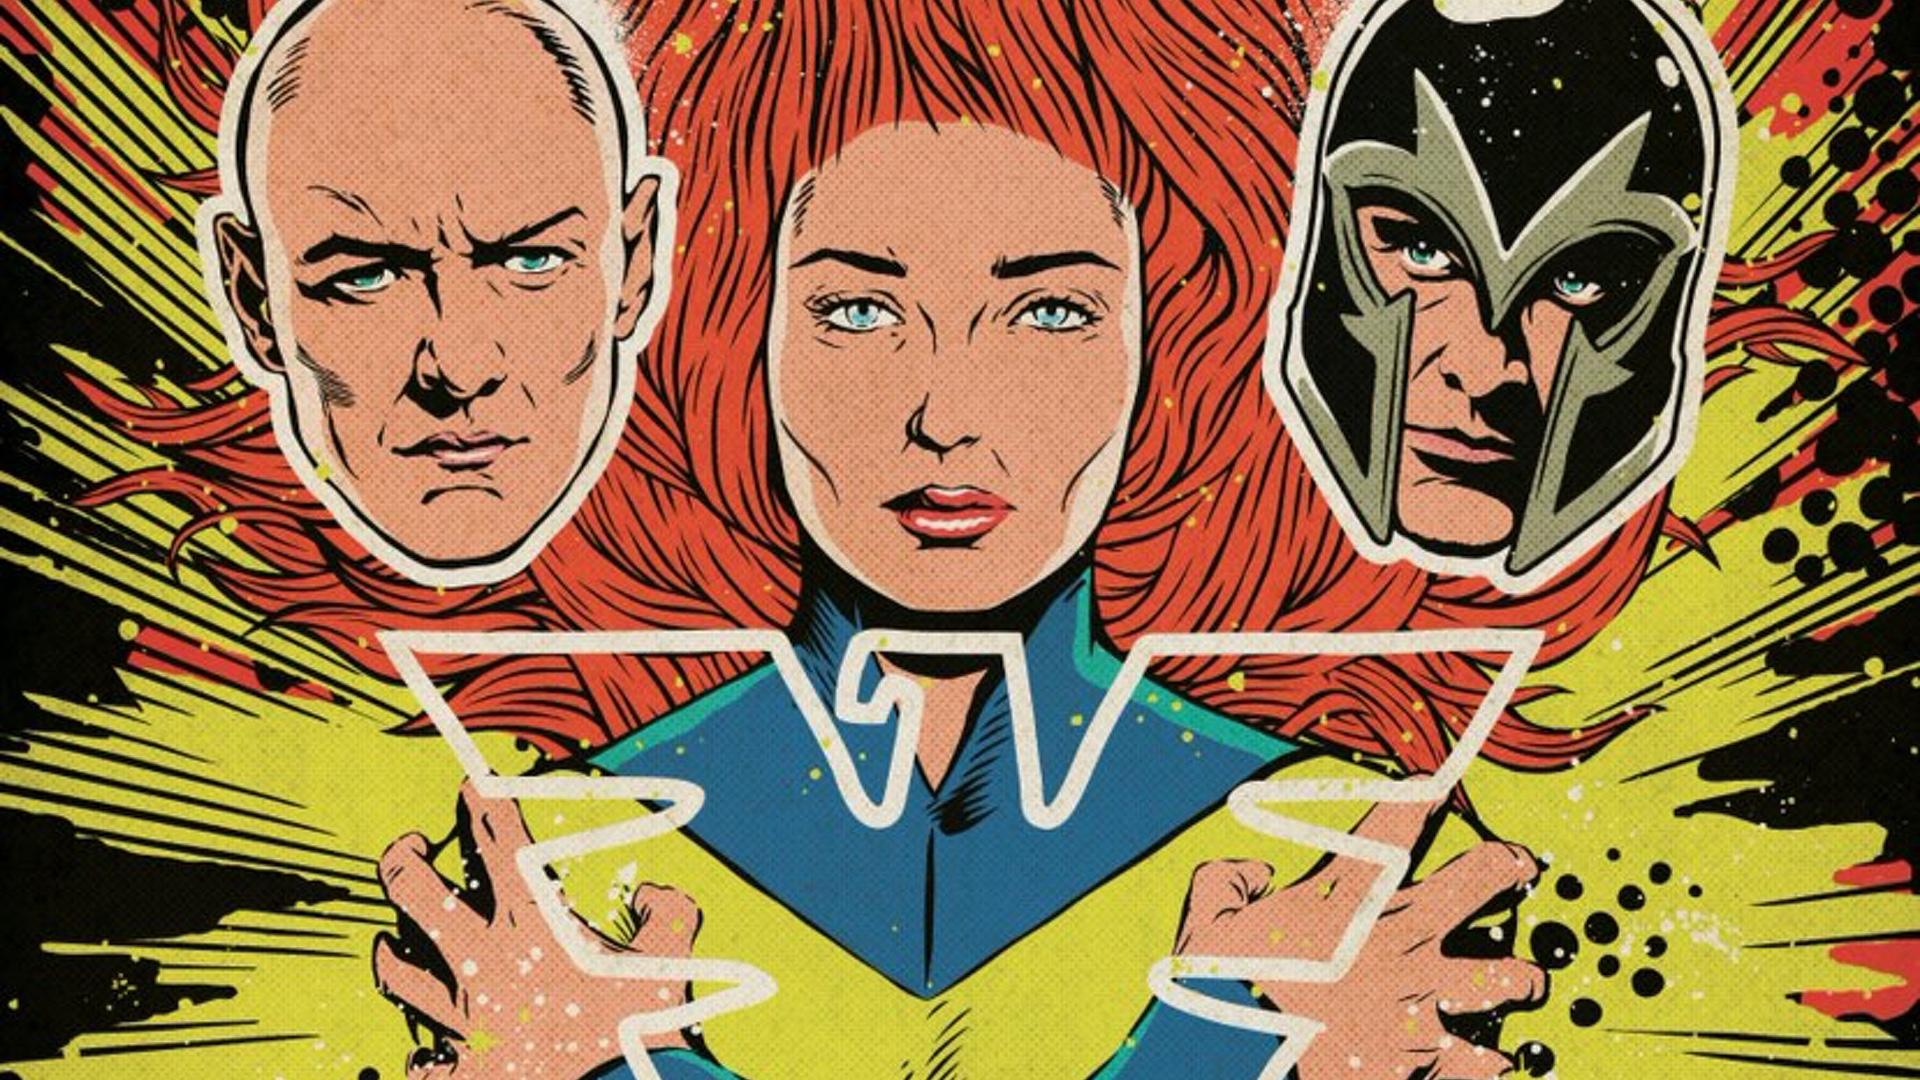 X,MEN DARK PHOENIX Gets Official Comic Book,Style Poster